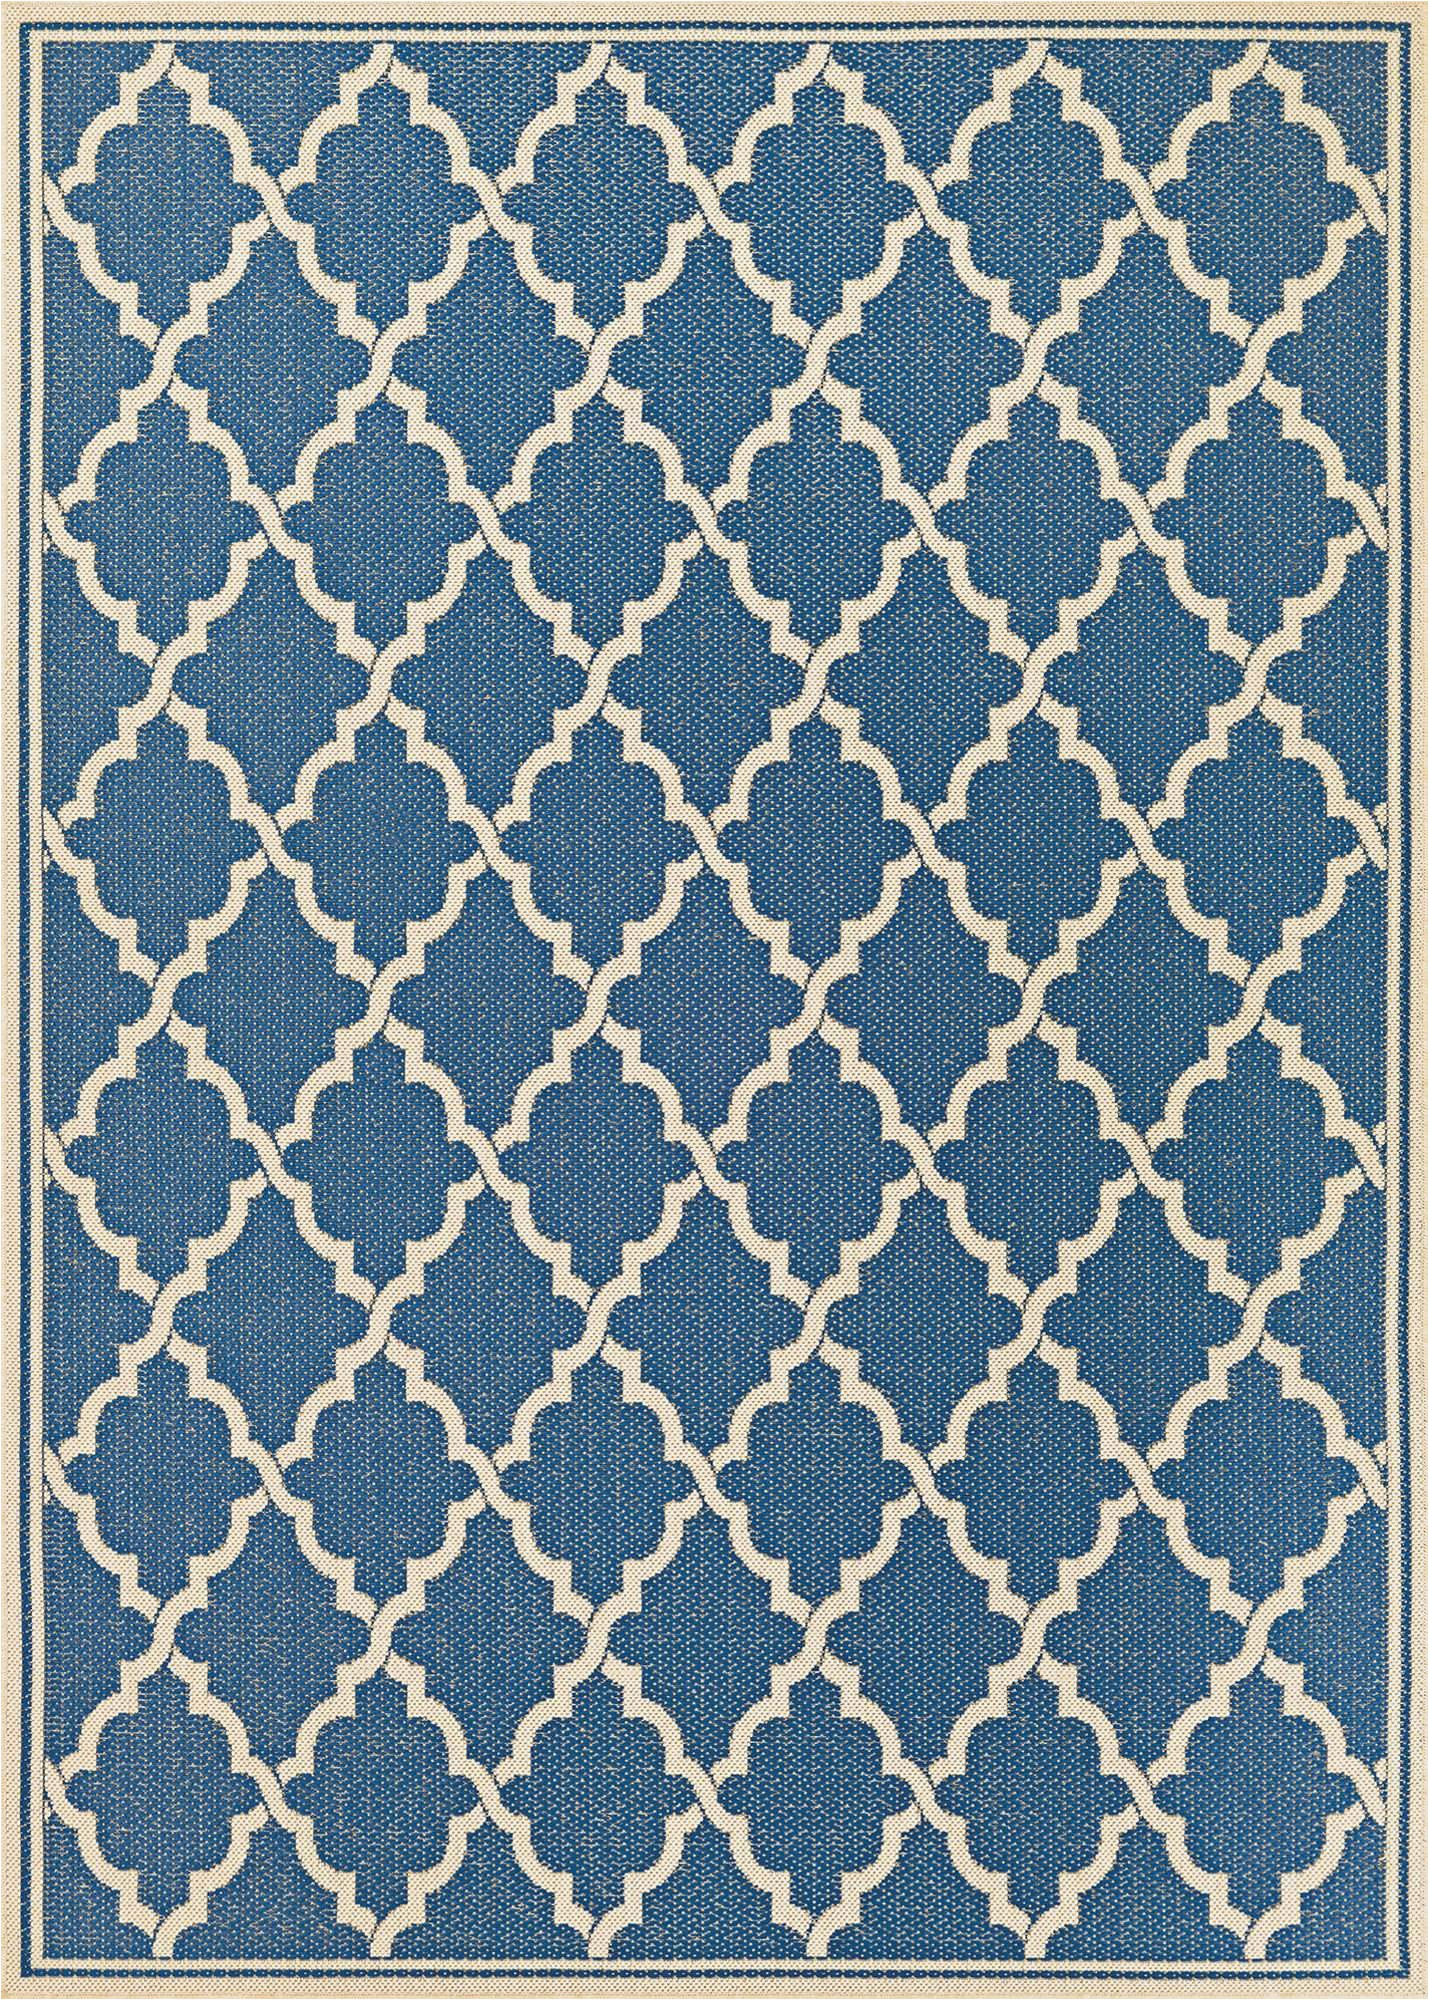 couristan monaco ocean port indoor outdoor modern area rugs azure sand 7881 1040 rug shop and more d f6 ce2d 4dfa a5ce 6739c3b157c5